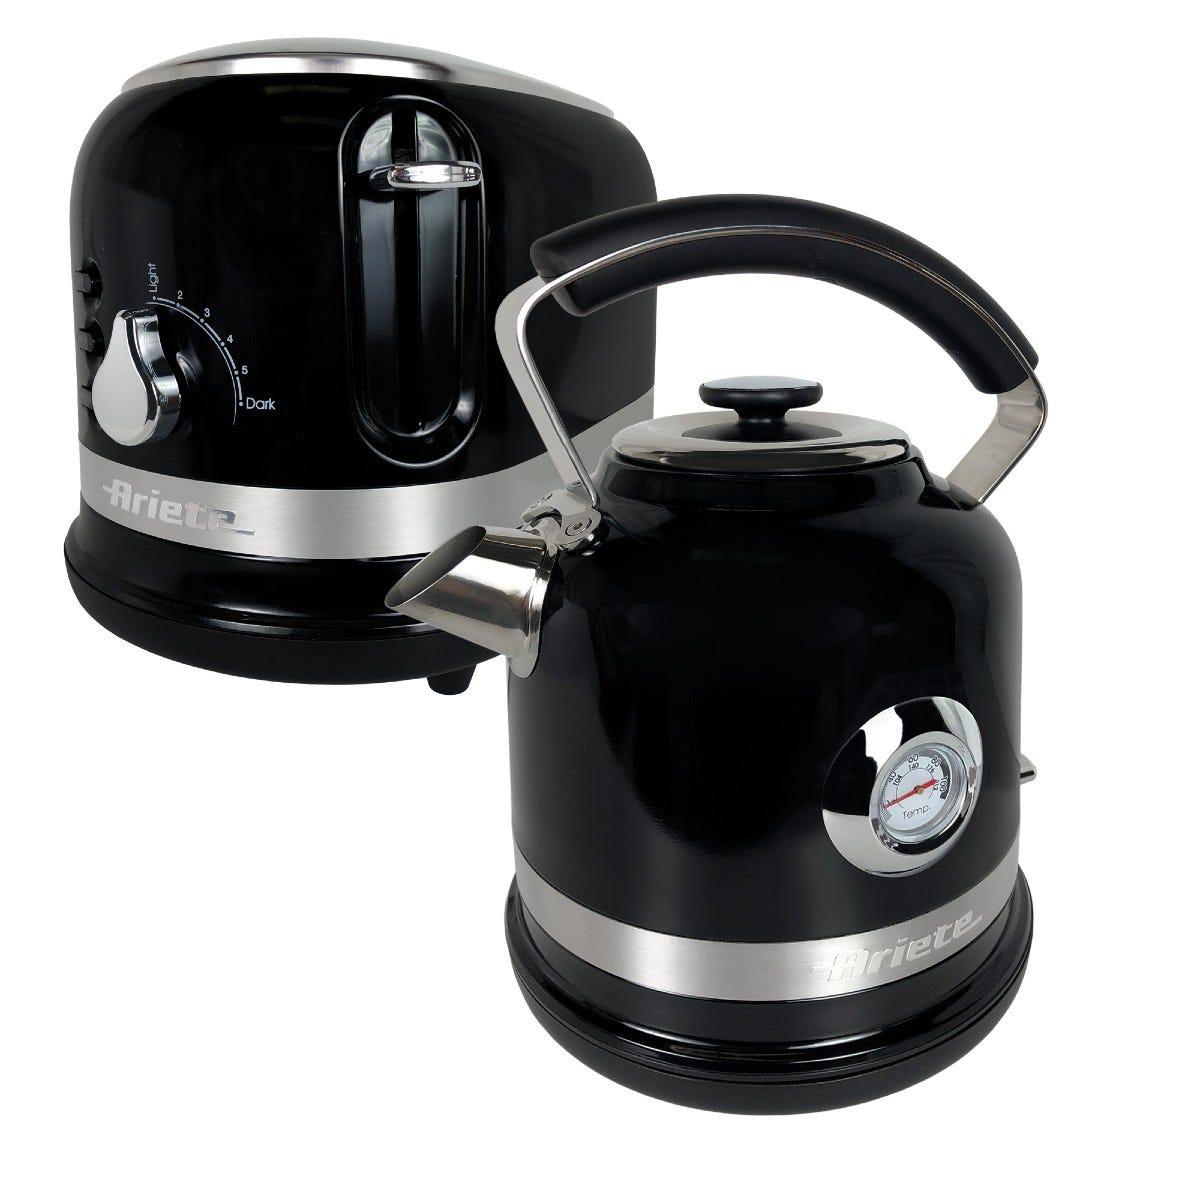 Ariette ARPK31 Moderna 1.7L Kettle and 2-Slice Toaster - Black